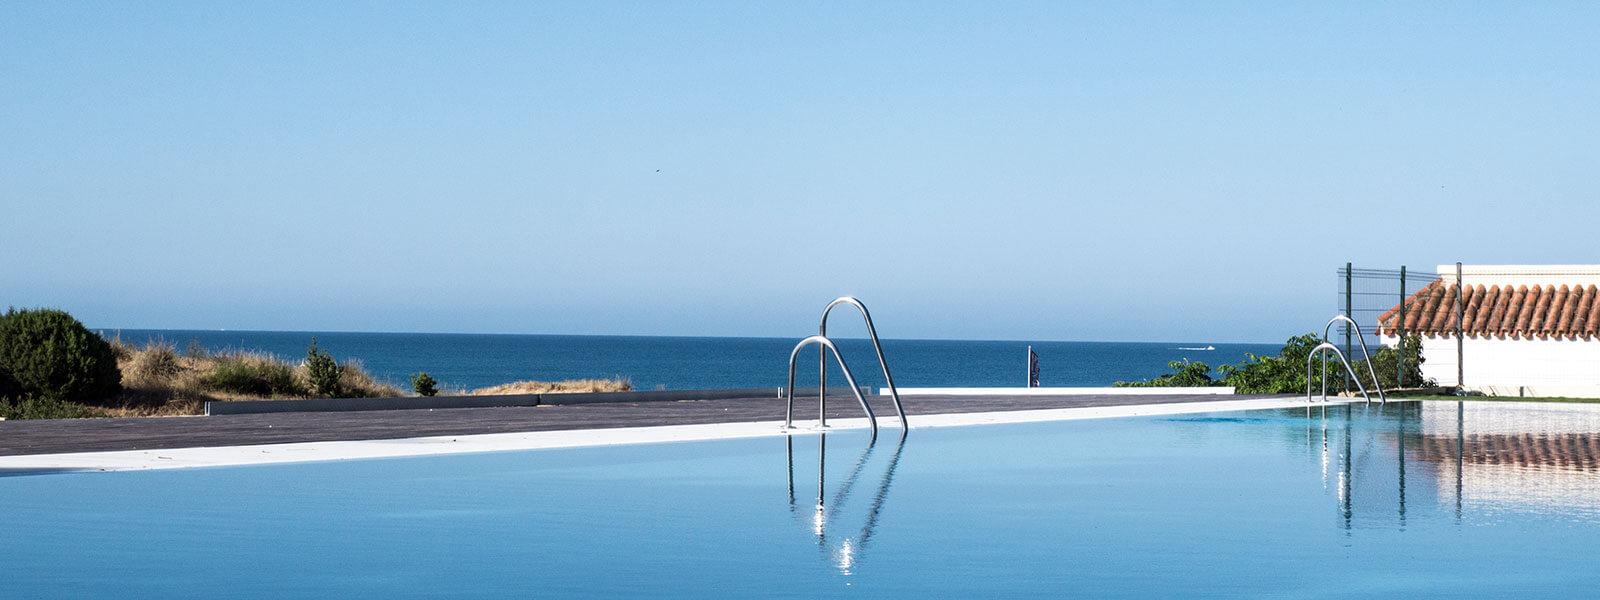 piscina del gran hotel del coto